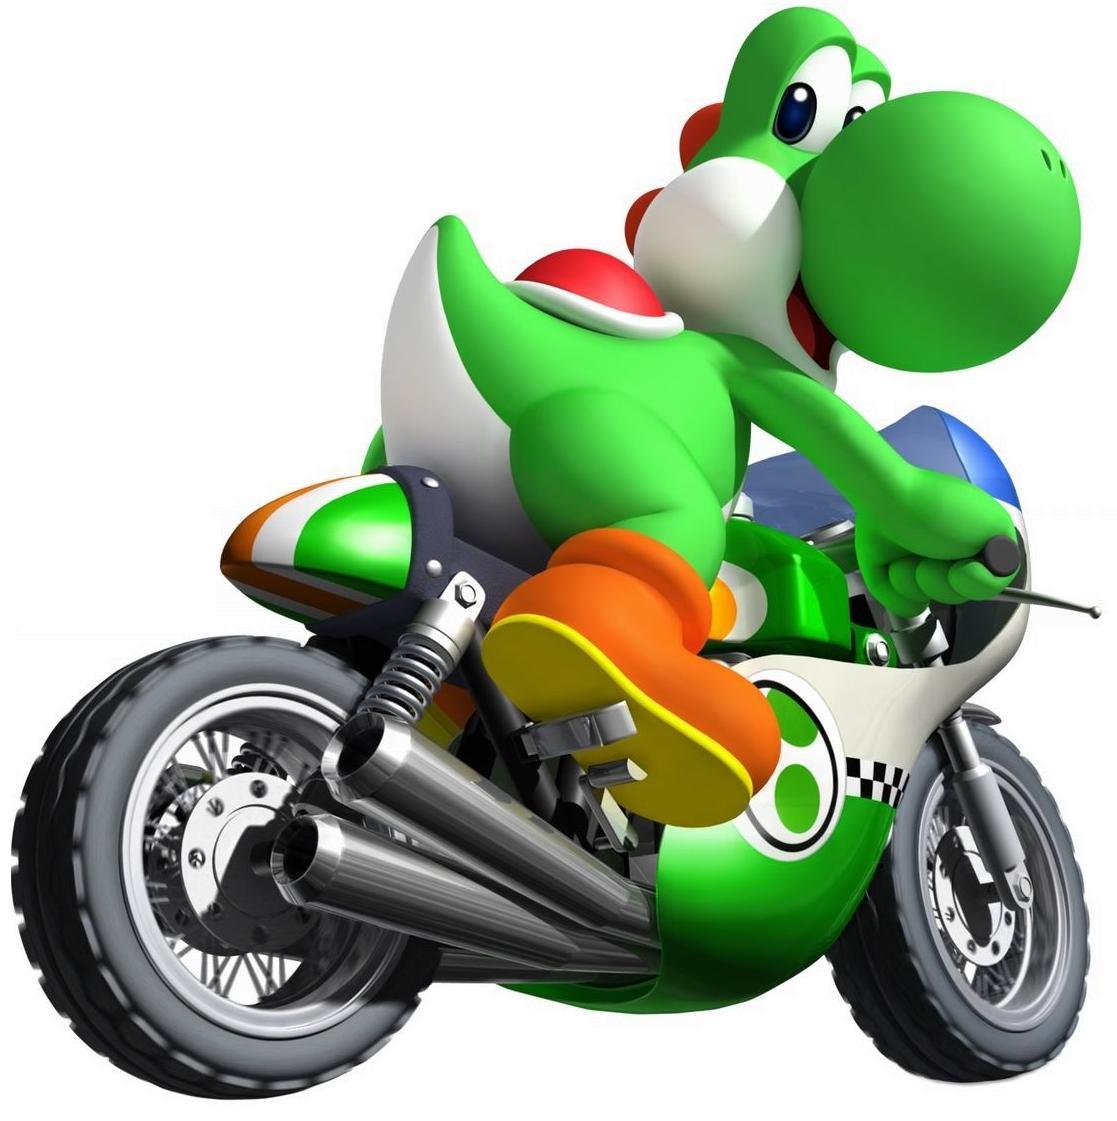 Mini Turbo Stat Mario Kart 8 Deluxe: The Mario Kart Racing Wiki